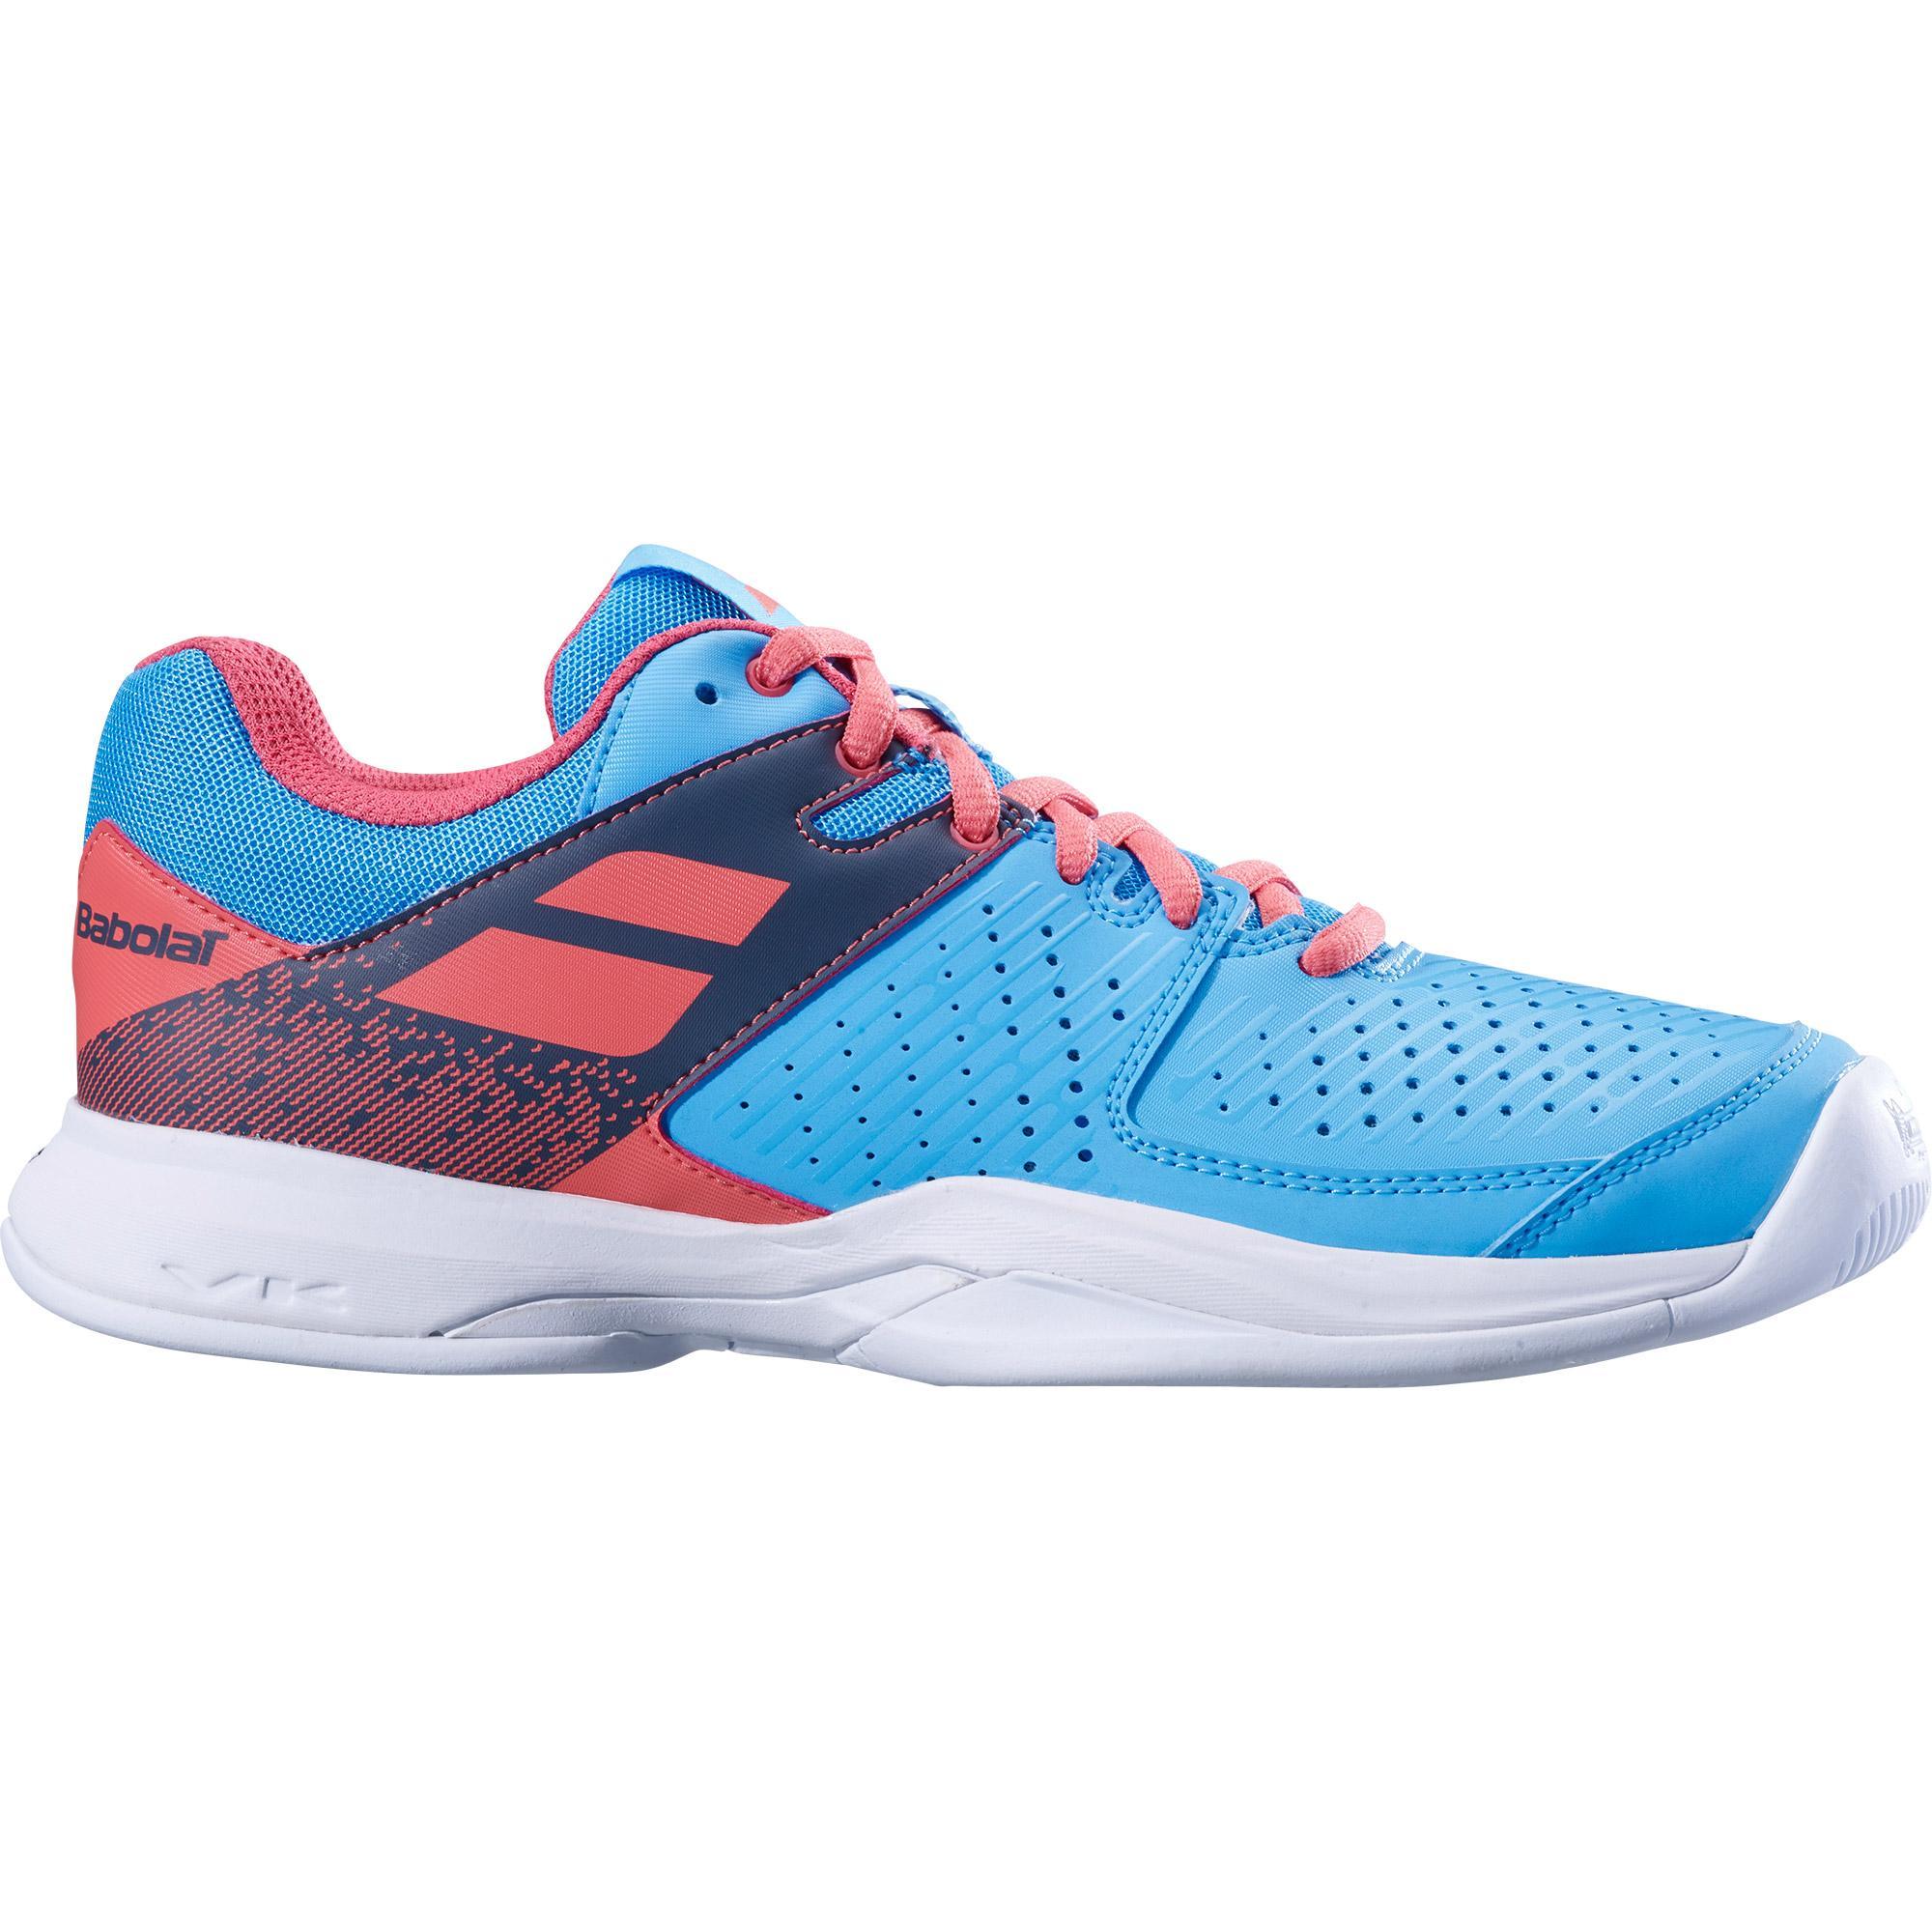 57039cca9963 Babolat Womens Pulsion Tennis Shoes - Sky Blue Pink - Tennisnuts.com